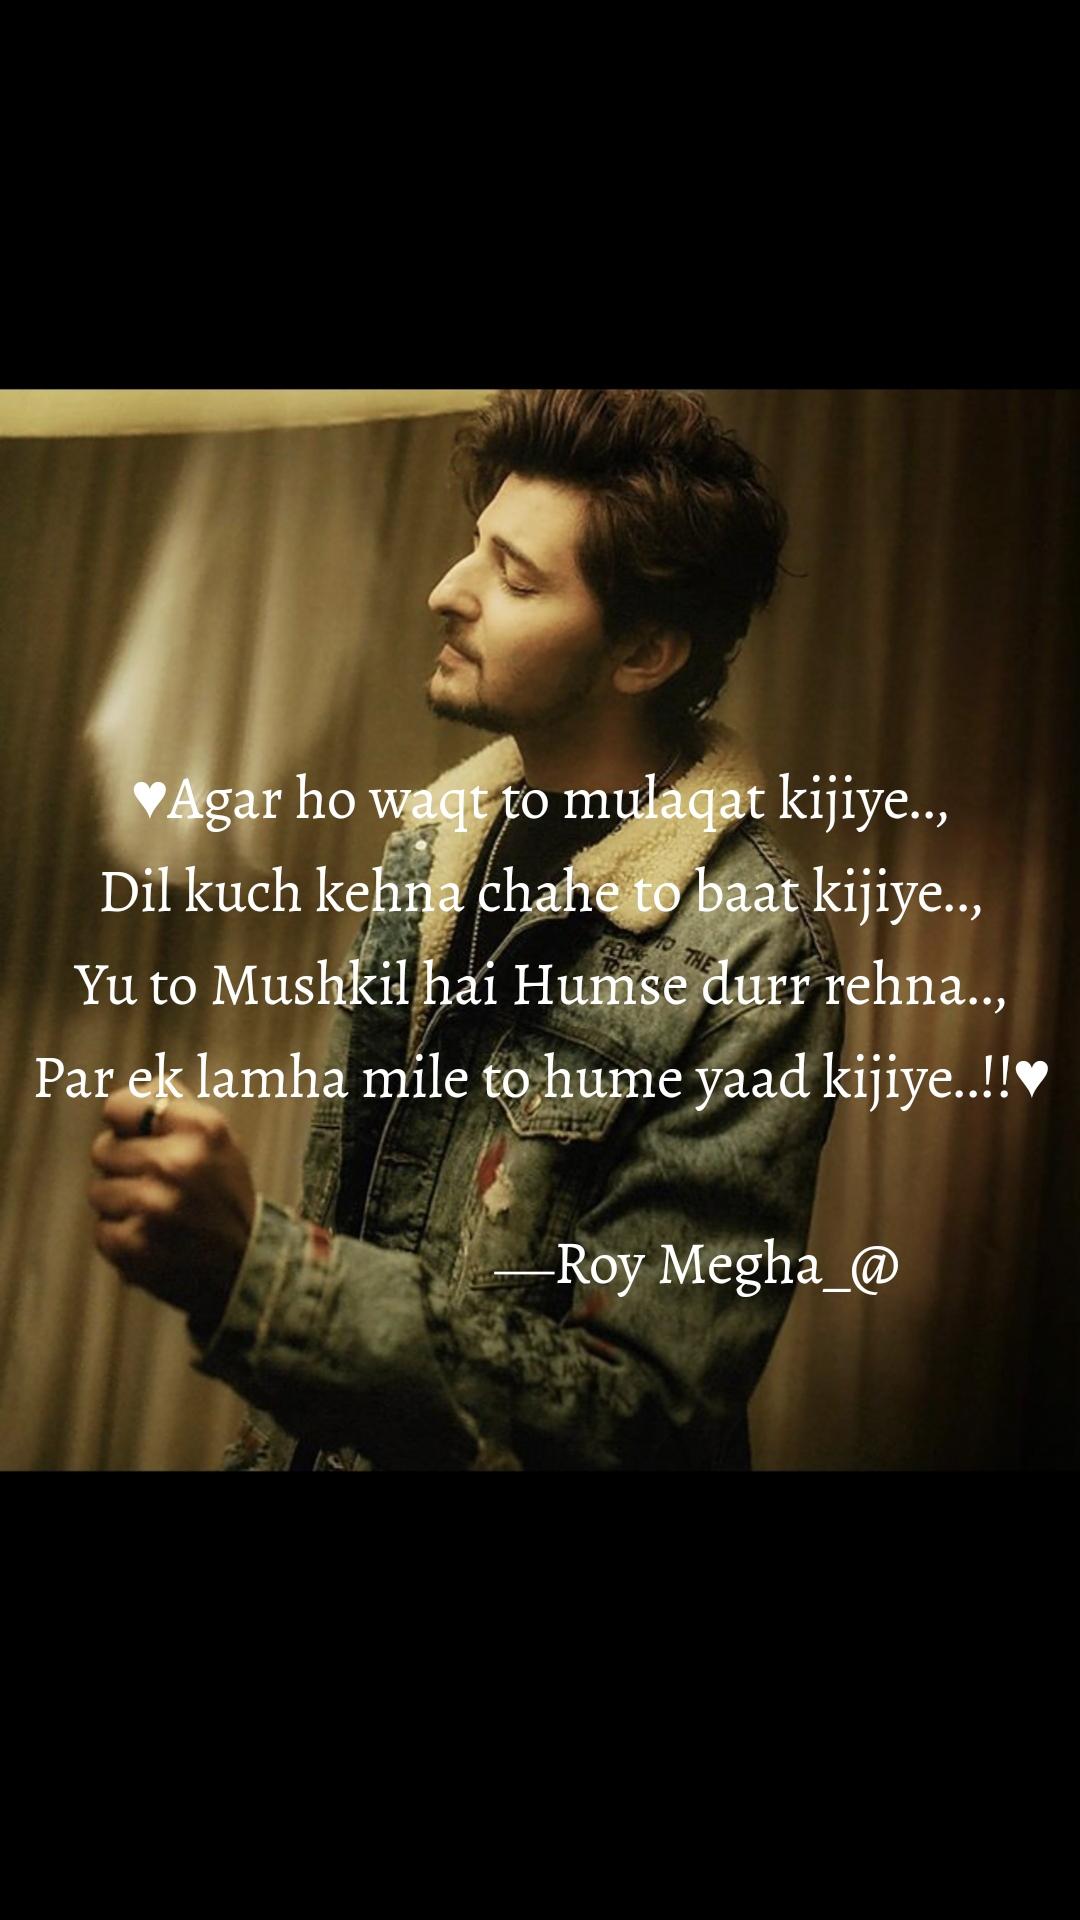 ♥Agar ho waqt to mulaqat kijiye.., Dil kuch kehna chahe to baat kijiye.., Yu to Mushkil hai Humse durr rehna.., Par ek lamha mile to hume yaad kijiye..!!♥                                                                                                   ⎯ Roy Megha_@